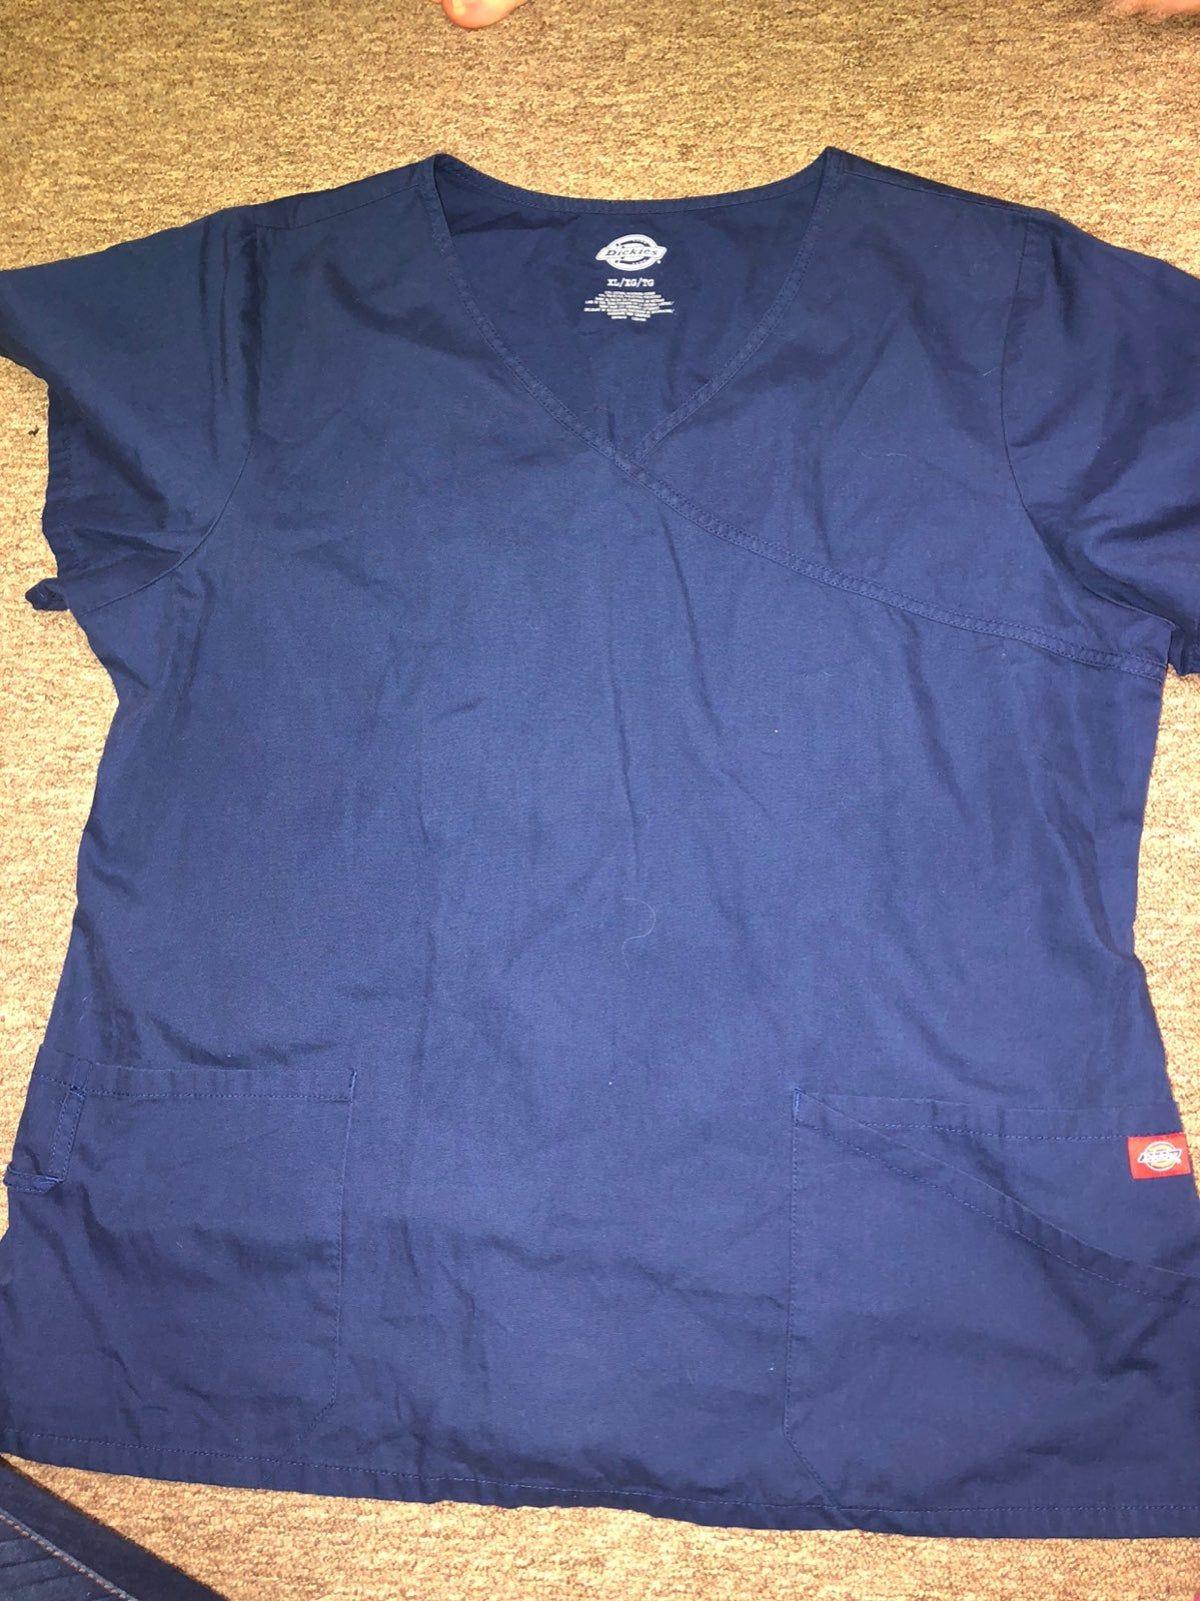 Dickies scrubs navyblue top